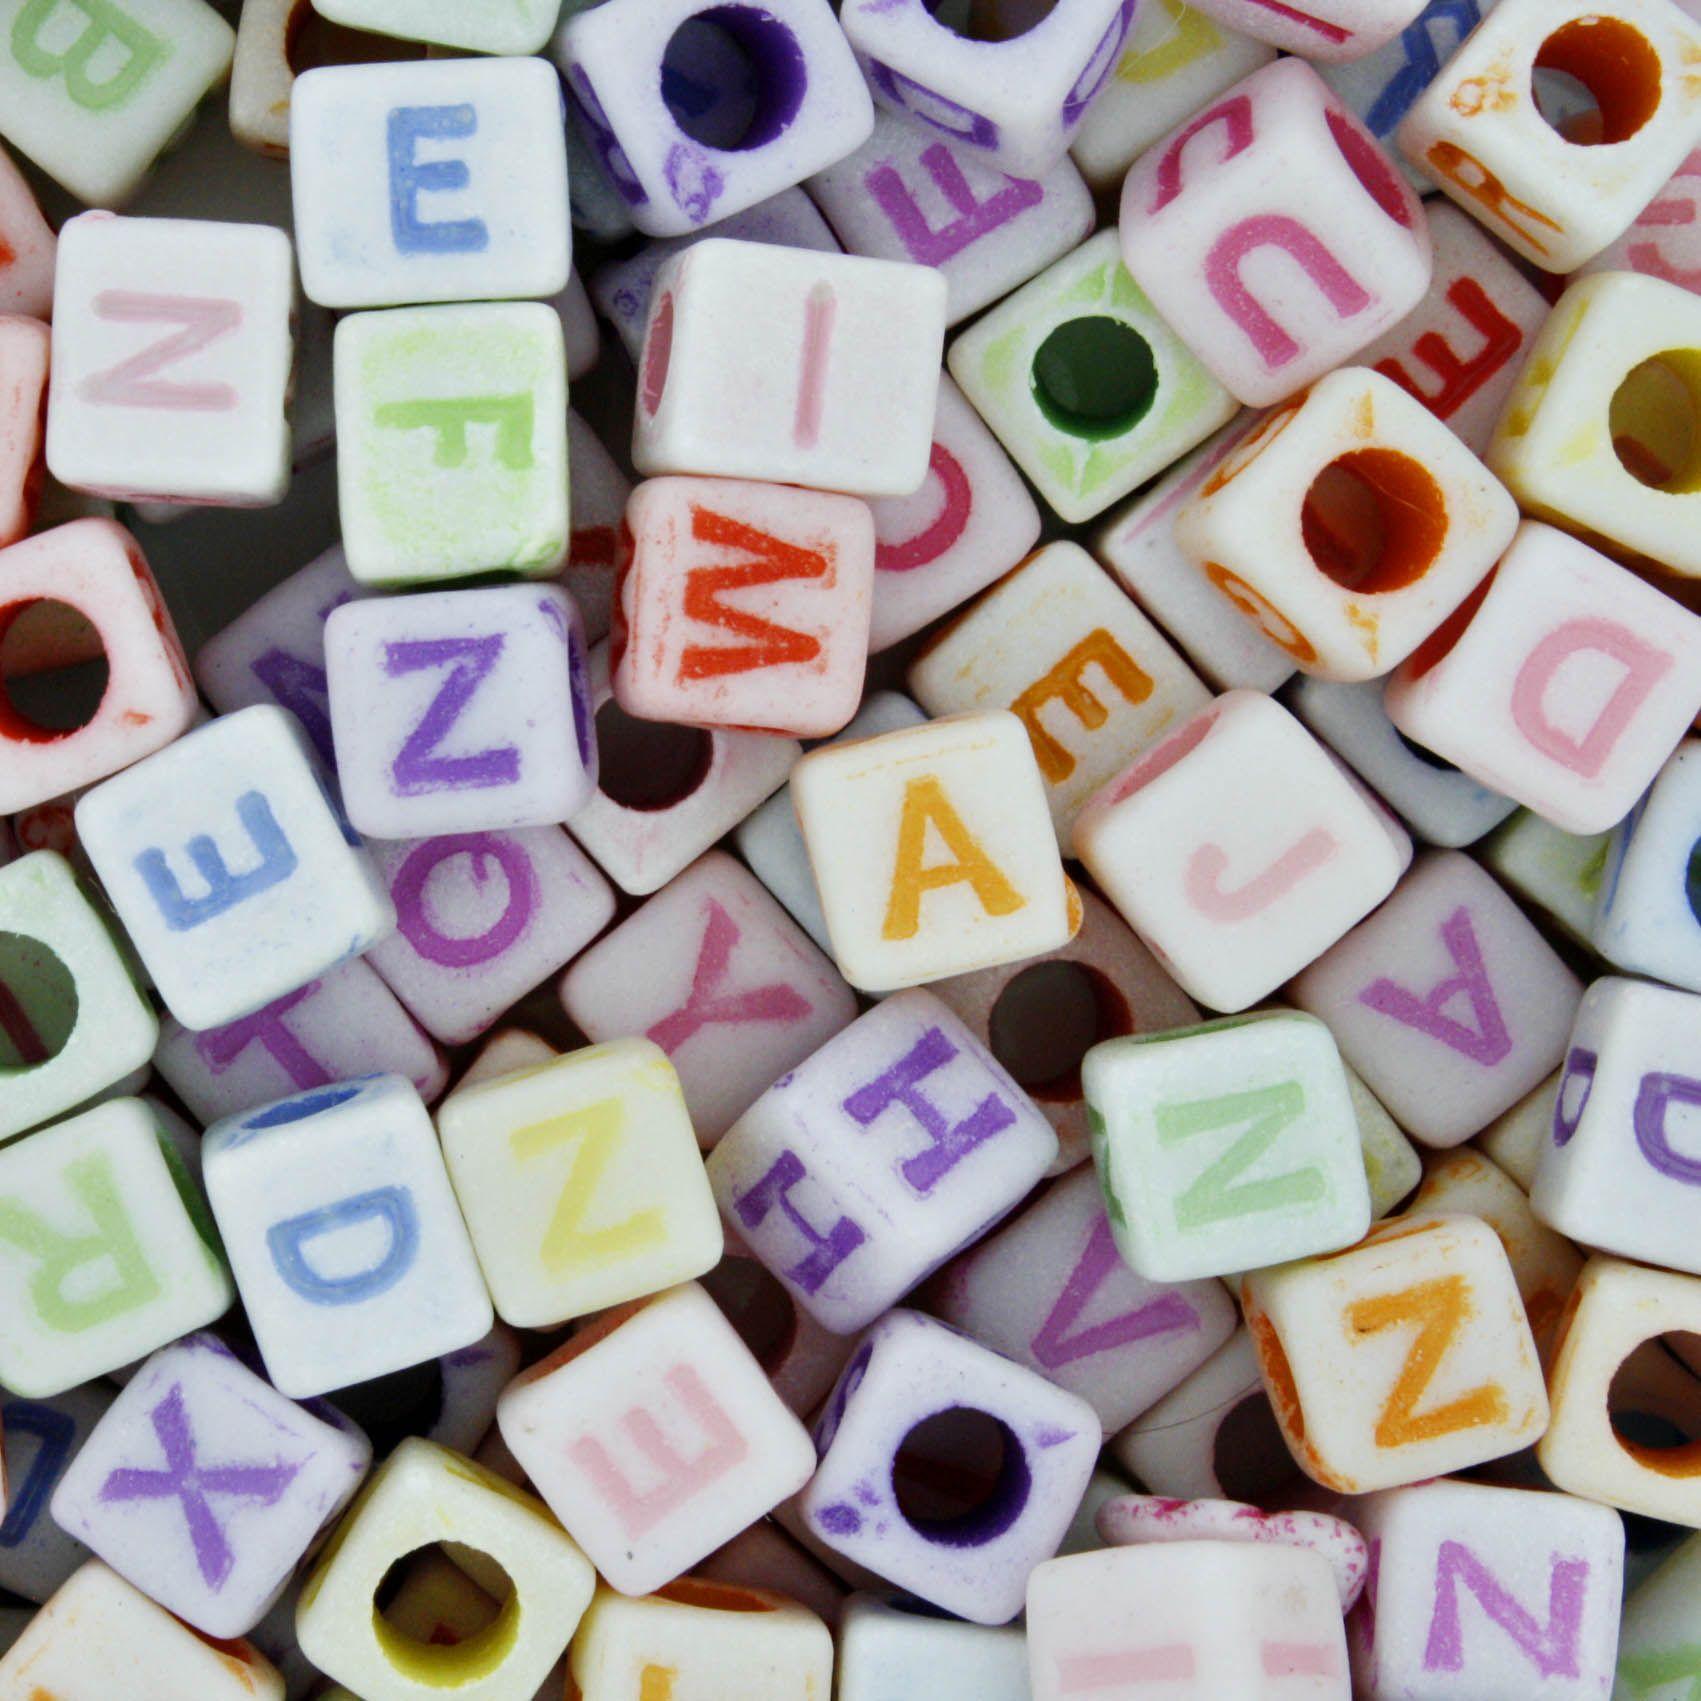 Miçanga Colorida / Infantil - Letras Cubo  - Stéphanie Bijoux® - Peças para Bijuterias e Artesanato